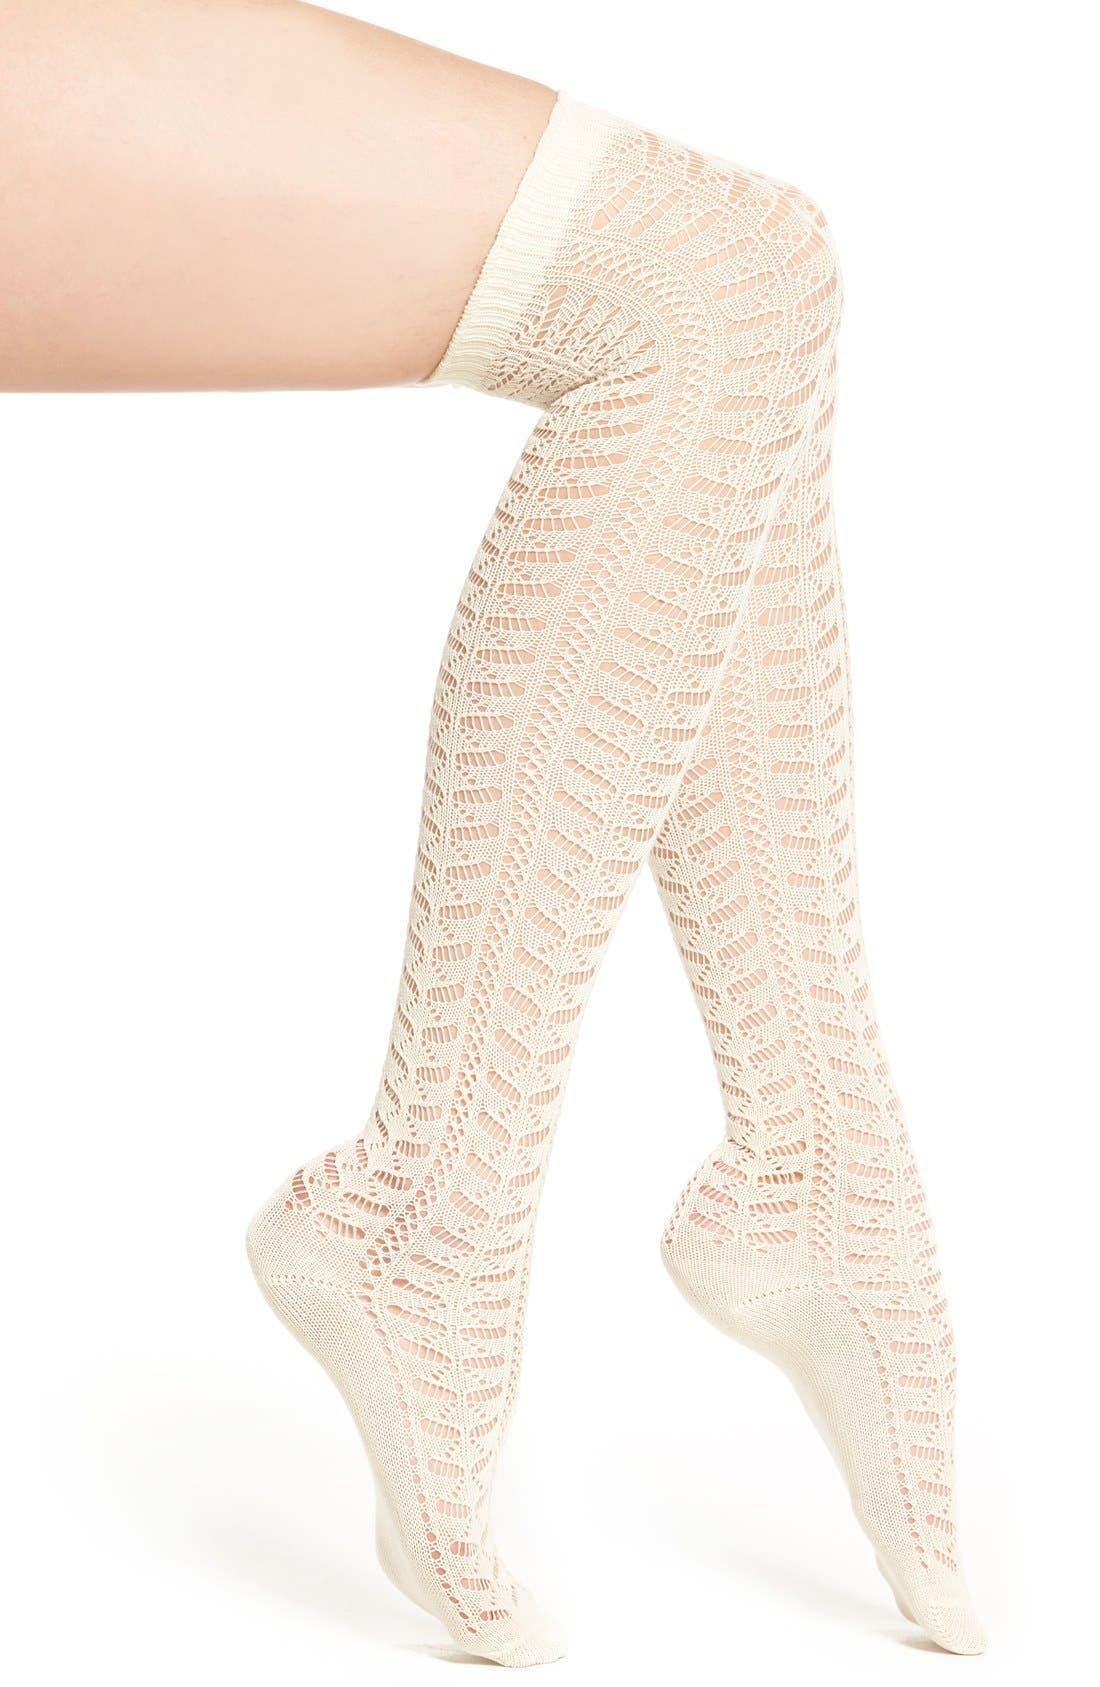 Main Image - Nordstrom Openwork Over the Knee Socks